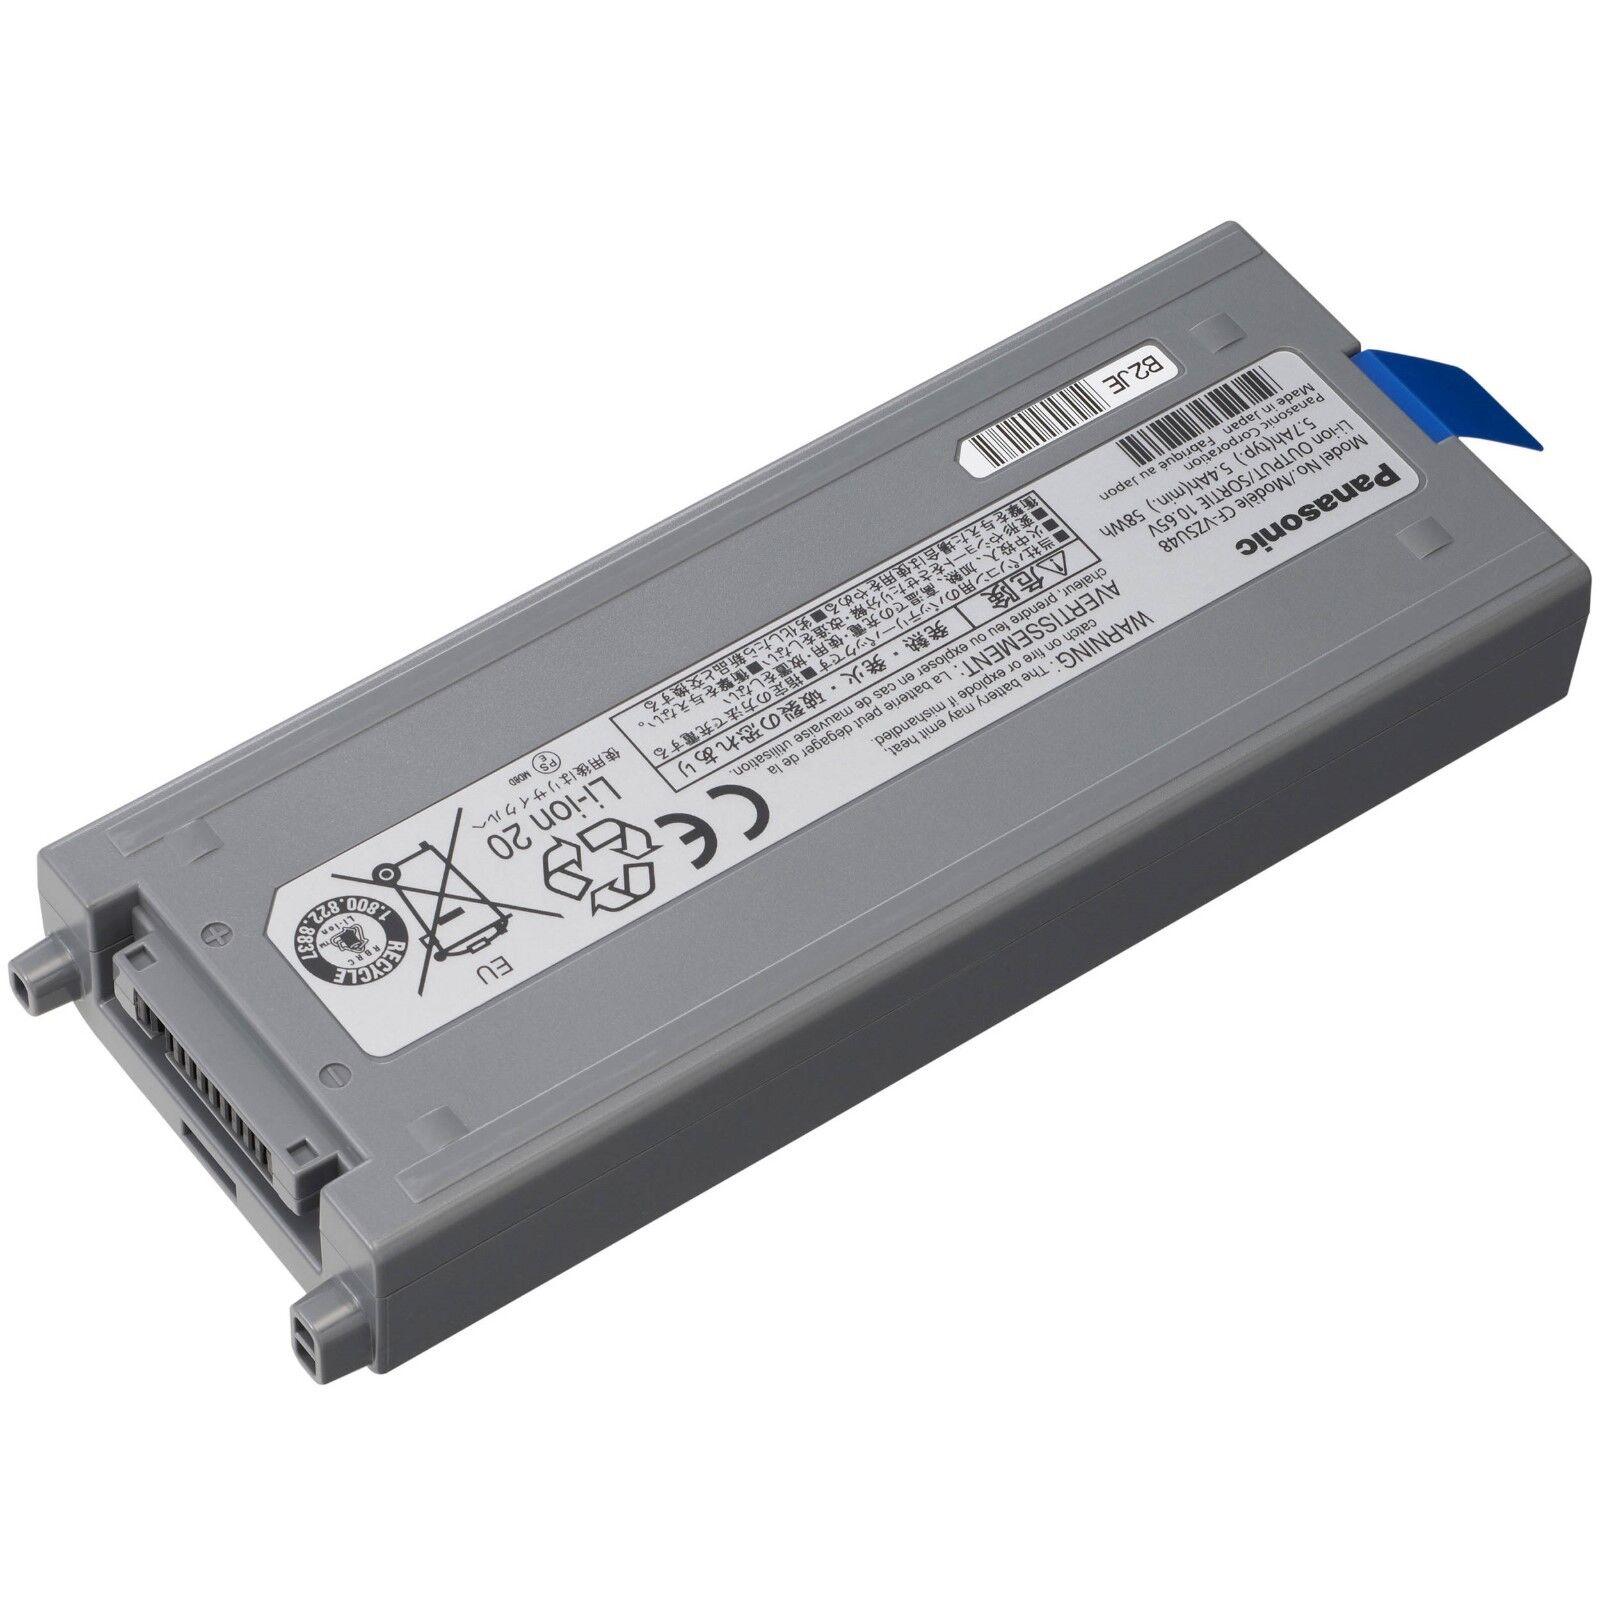 Panasonic CF-VZSU48 Genuine Battery for CF-19 ALL MKs 100 % Health